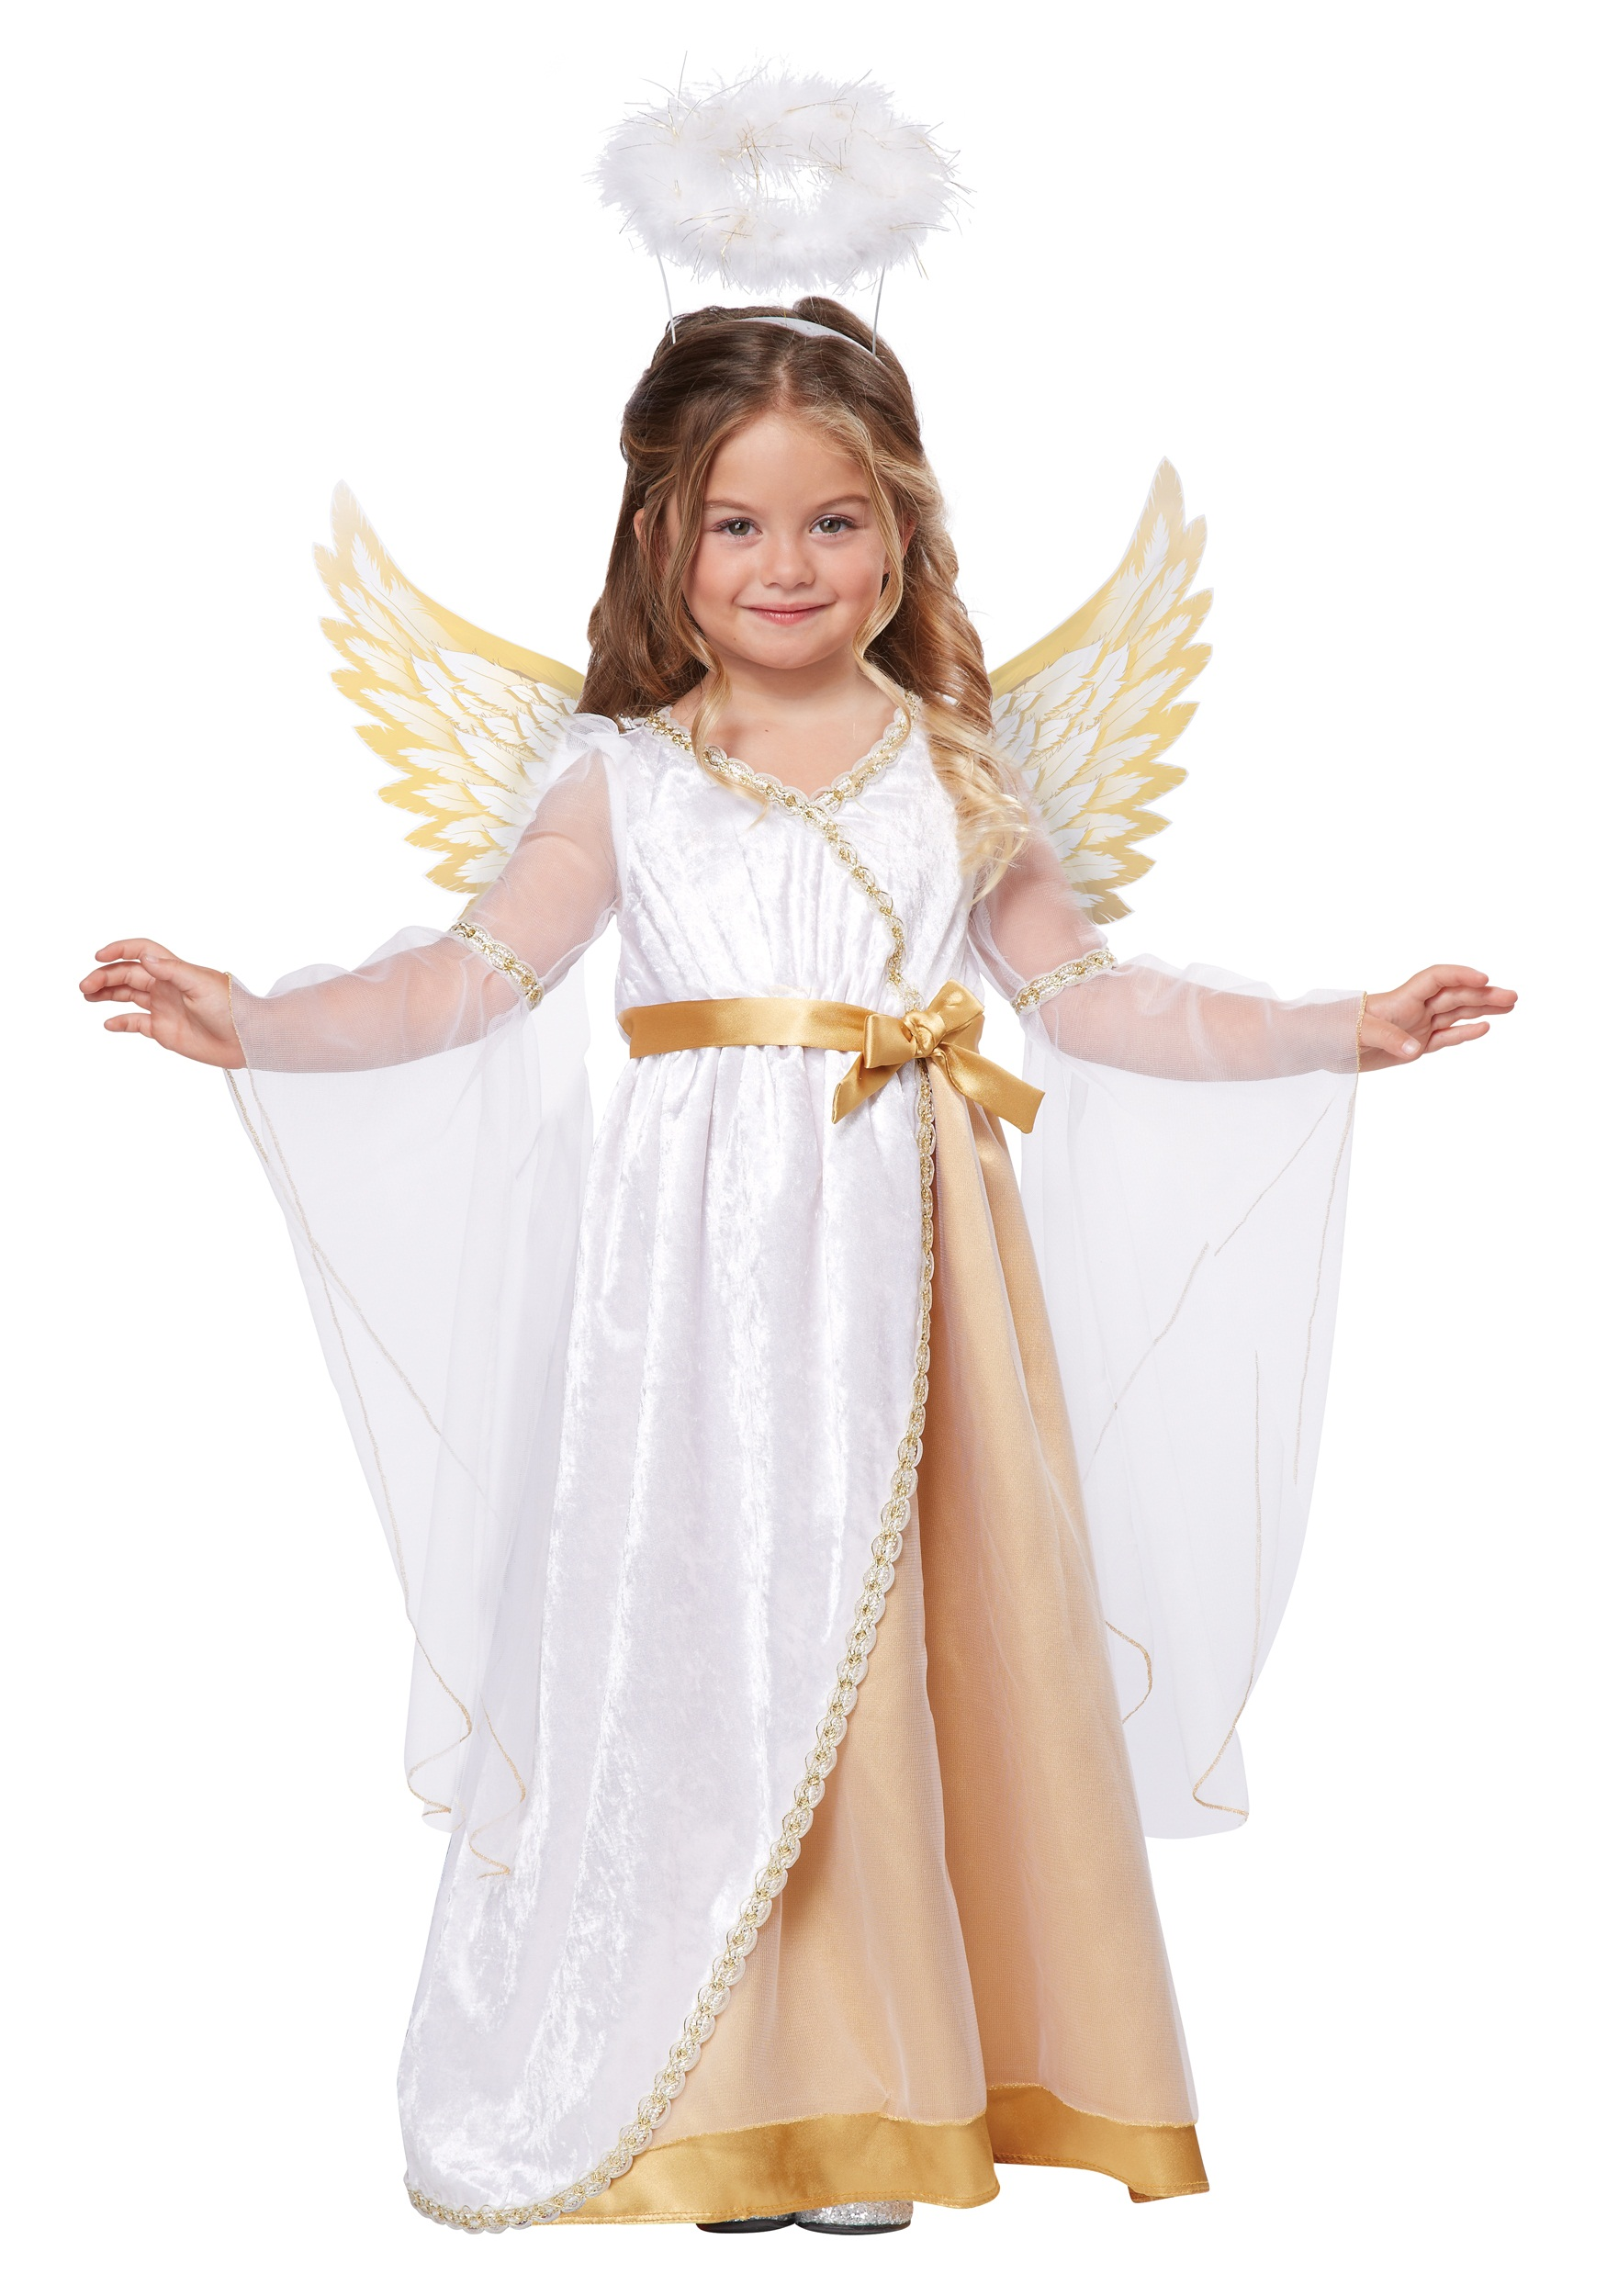 Angel Little Nude Photos 6